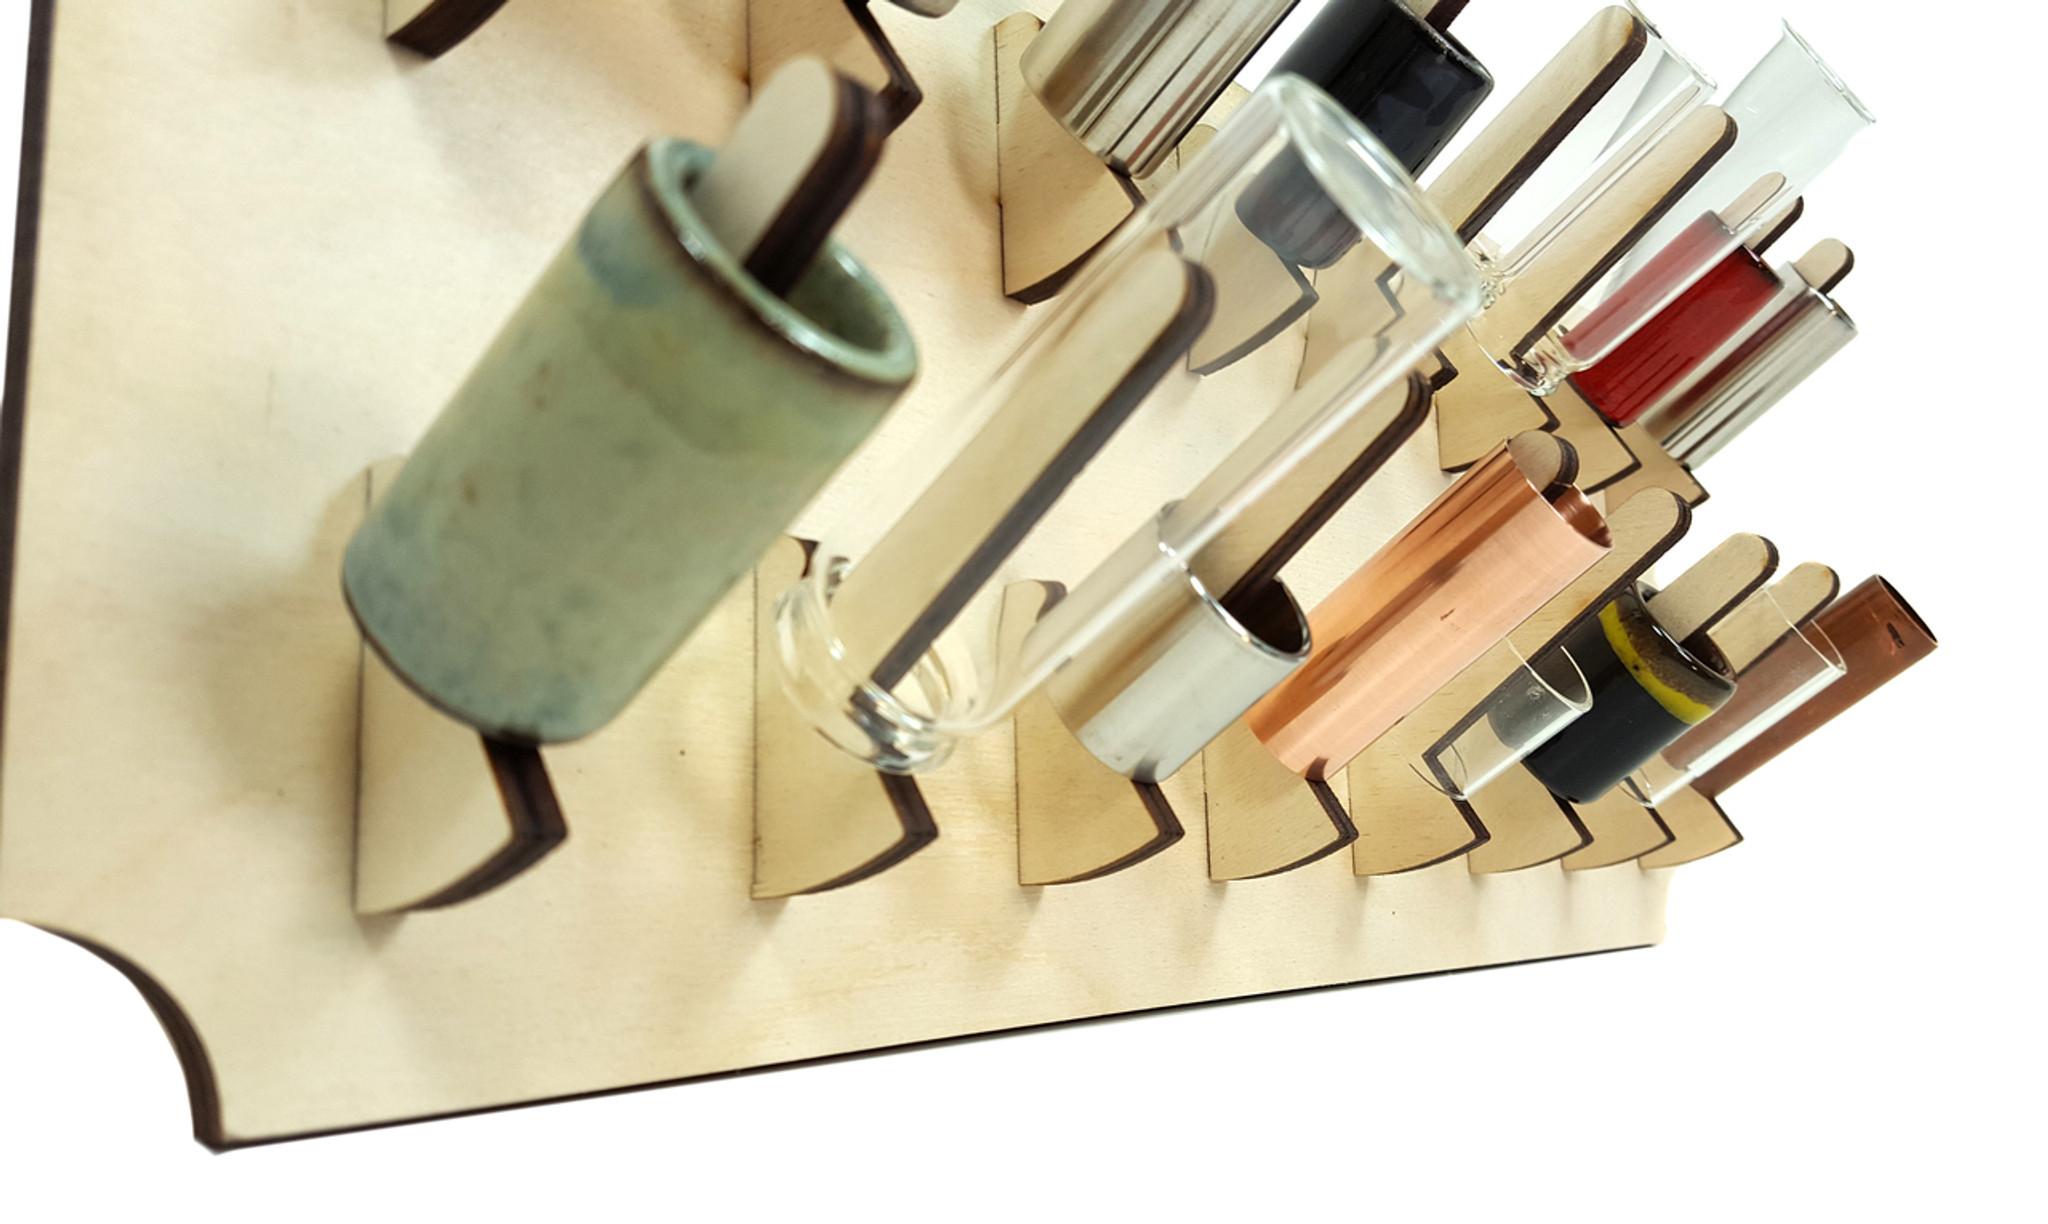 Wall-mount Guitar Slide Display Rack Kit - Easy to Assemble ...